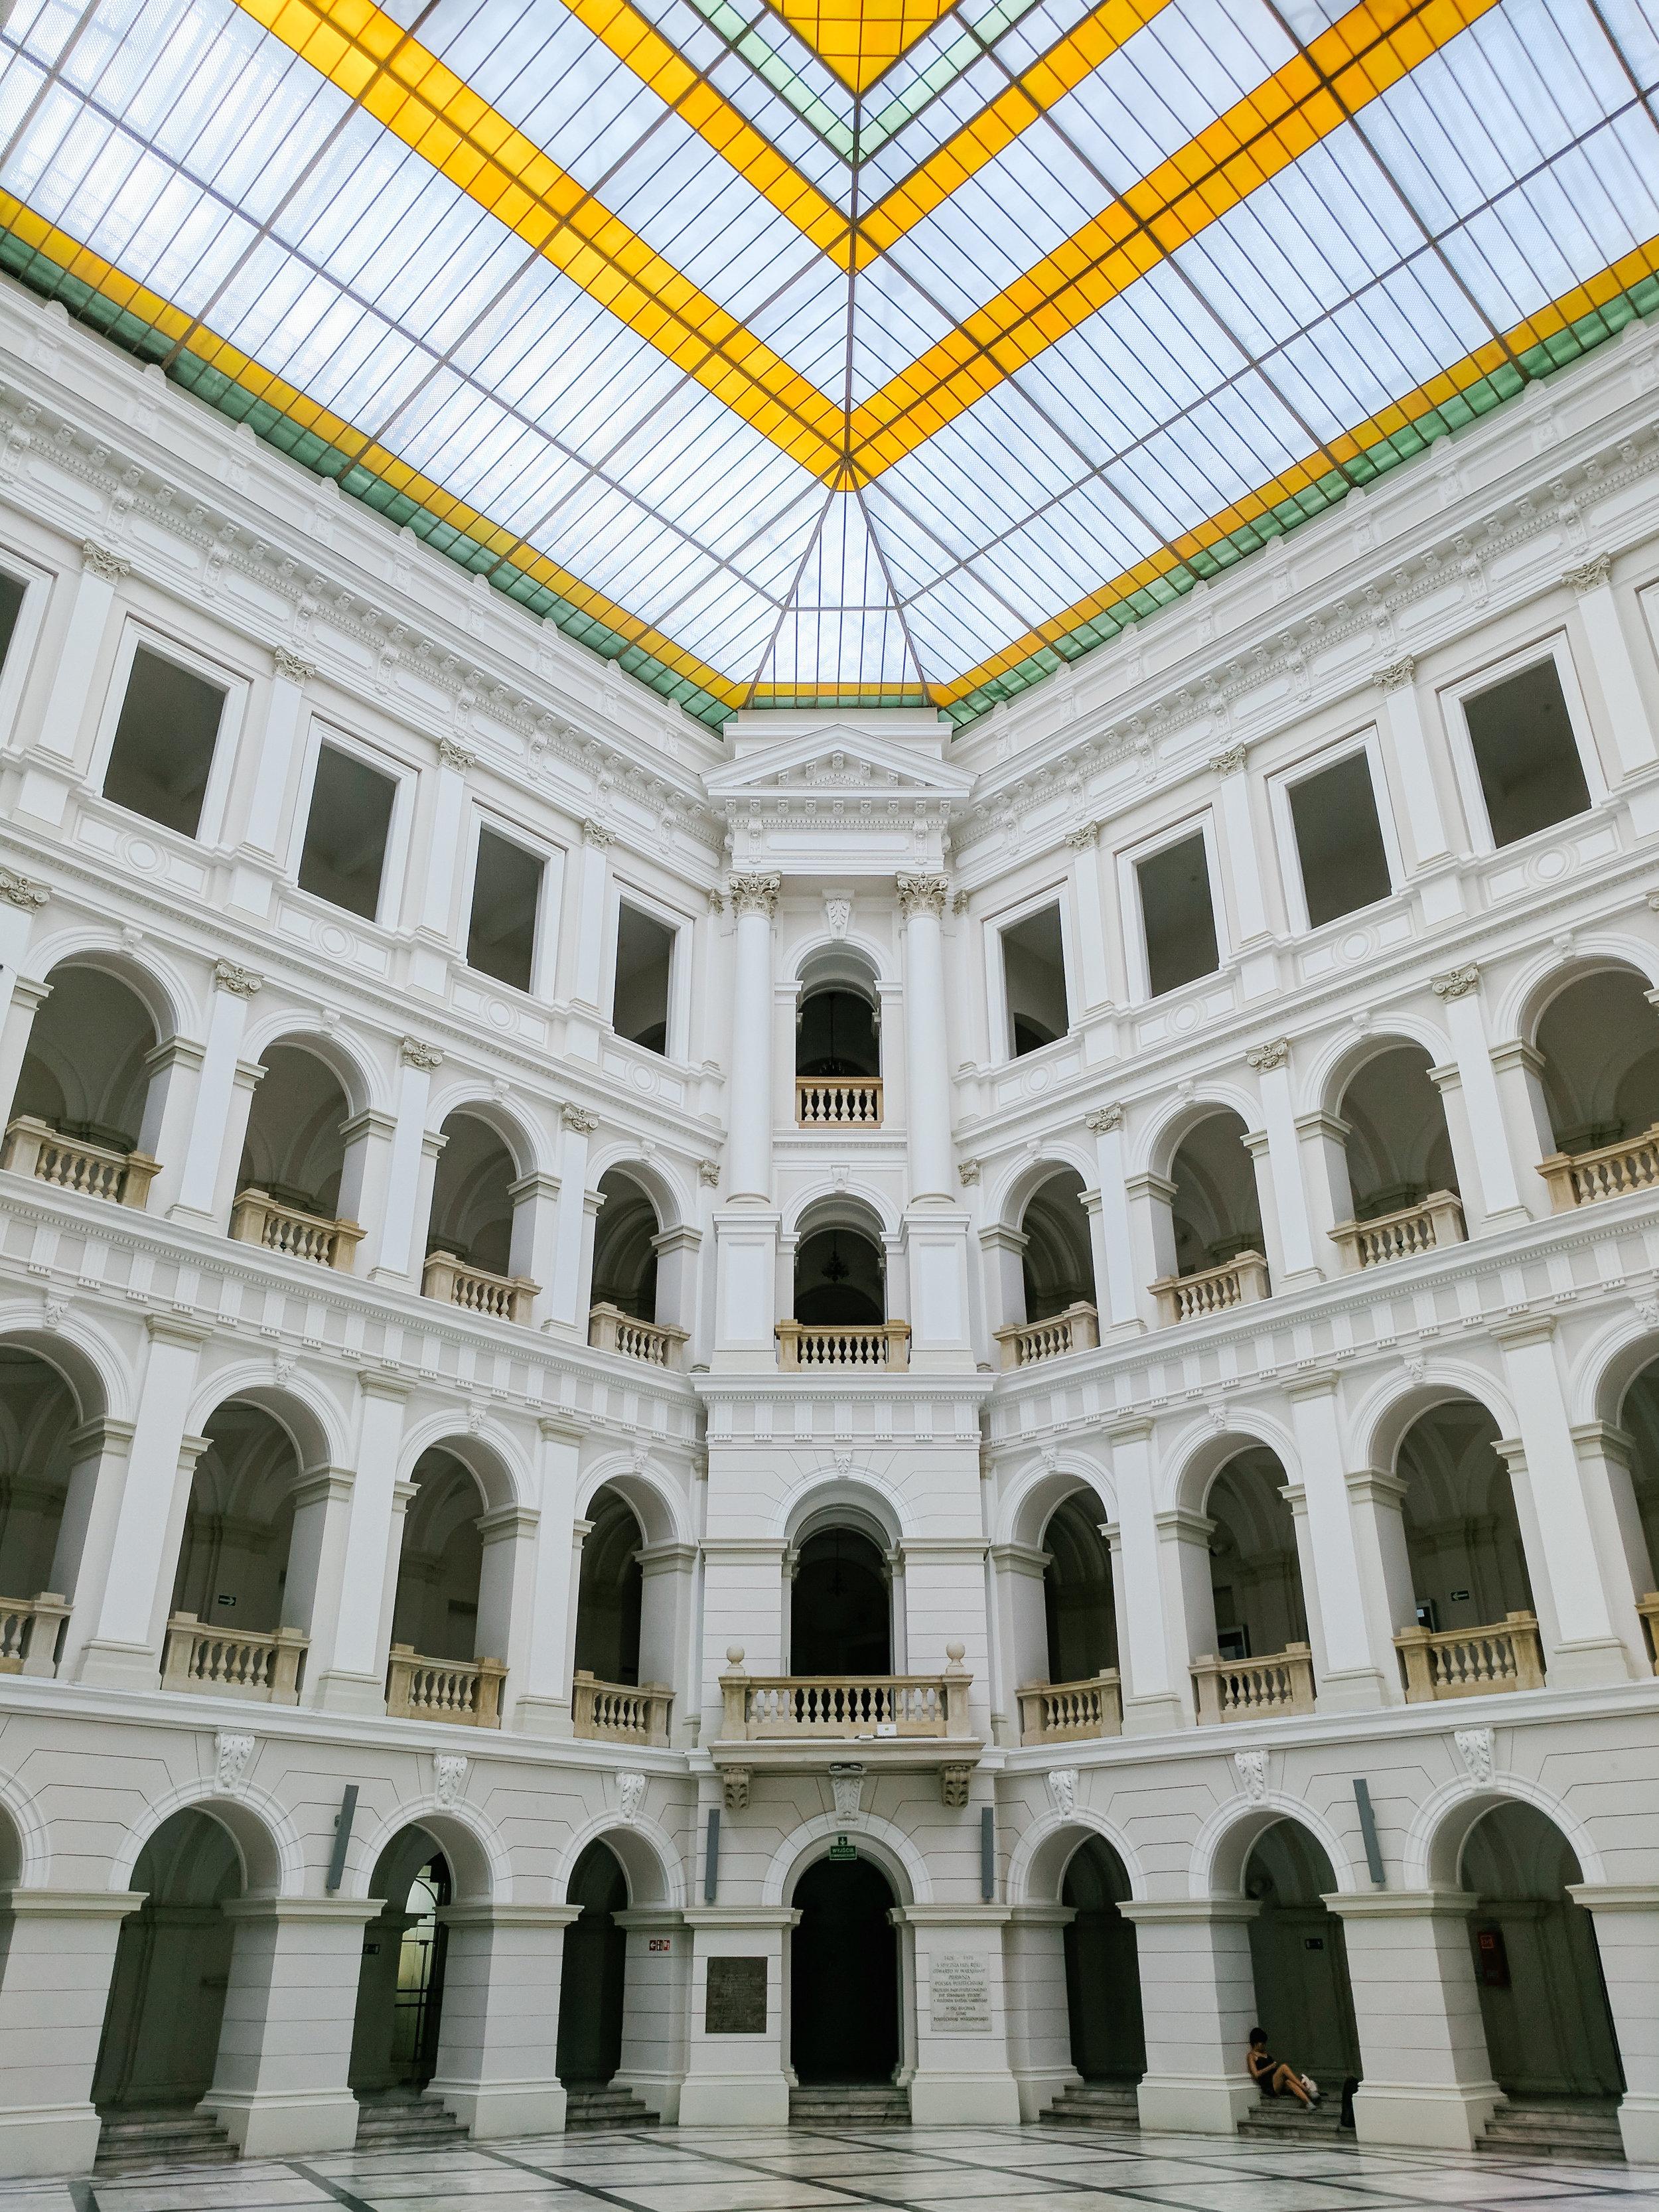 Warsaw University of Technology, Main Hall